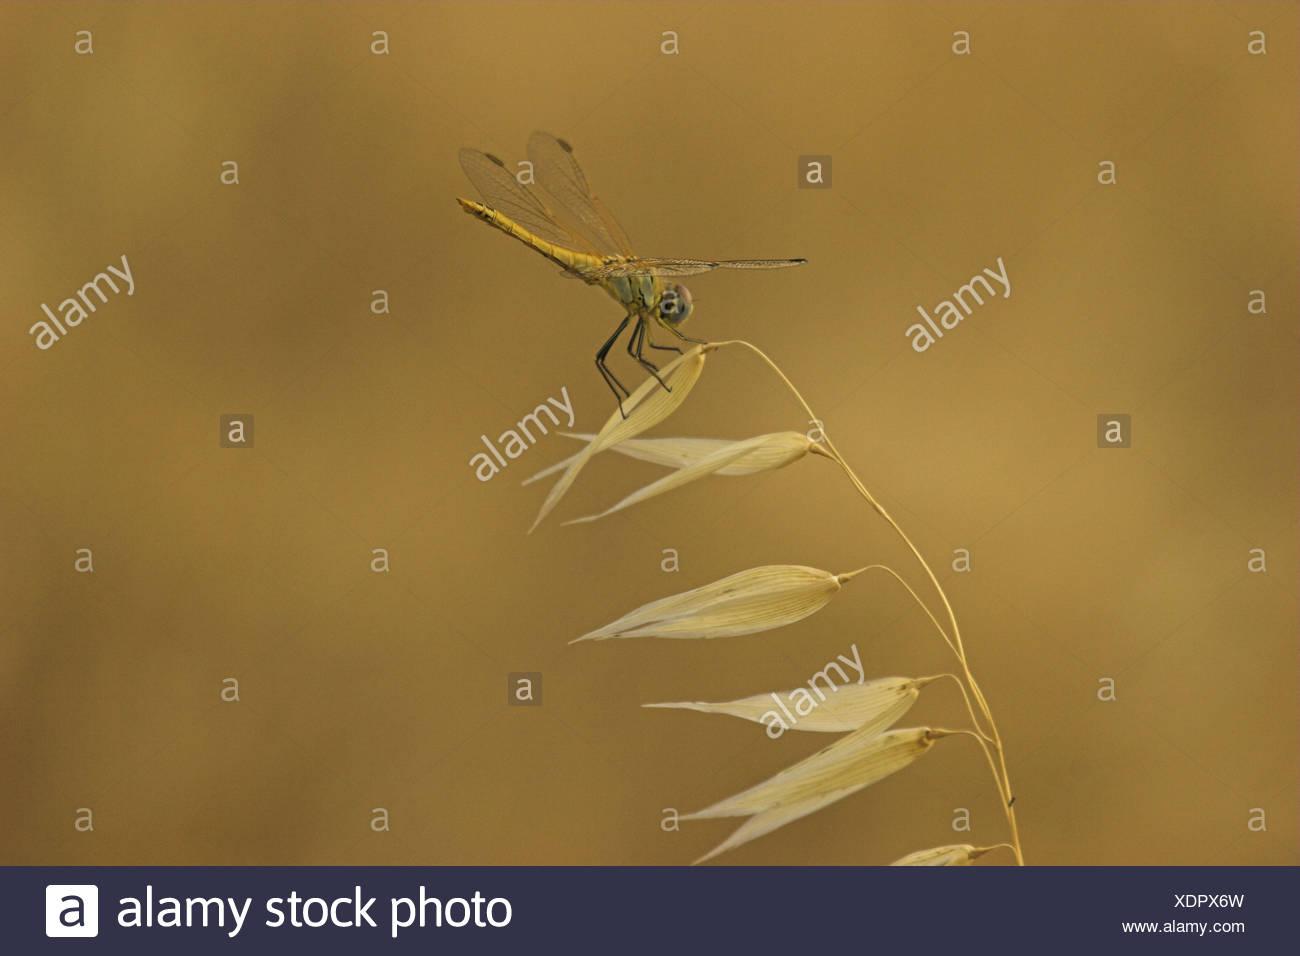 scarlet darter (Crocothemis erythraea), on wild oat (Avena fatua), France, Provence Stock Photo